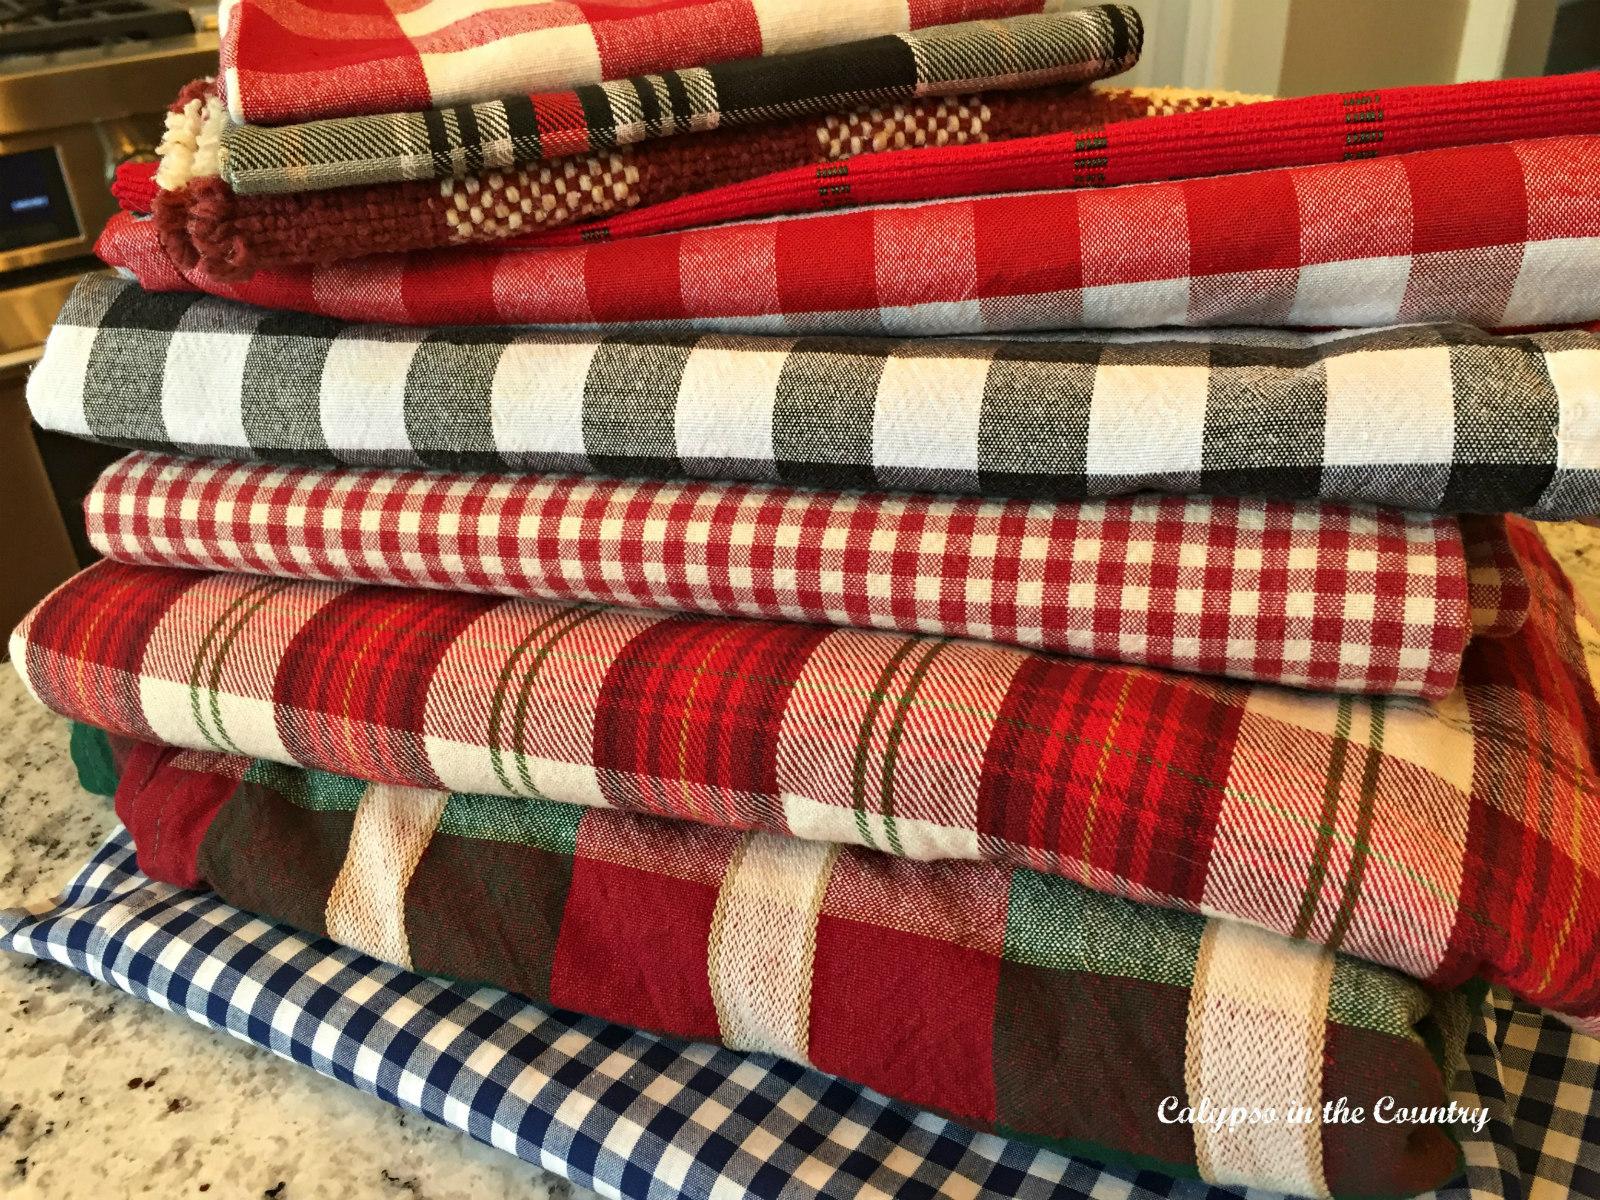 Pile of Plaid Tablecloths